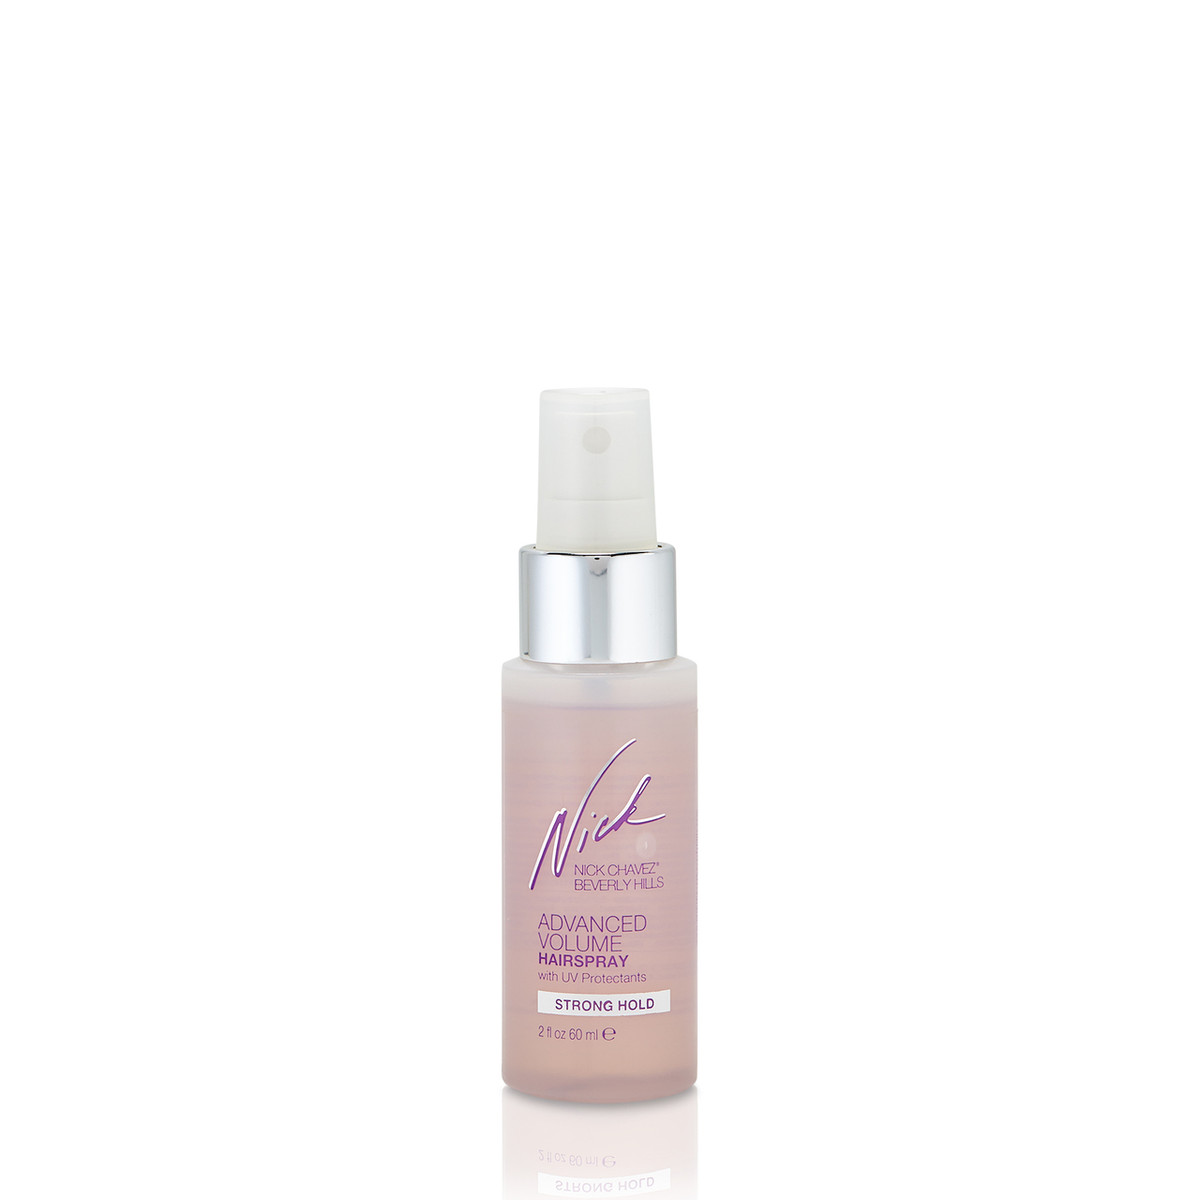 2oz Advanced Volume Hairspray